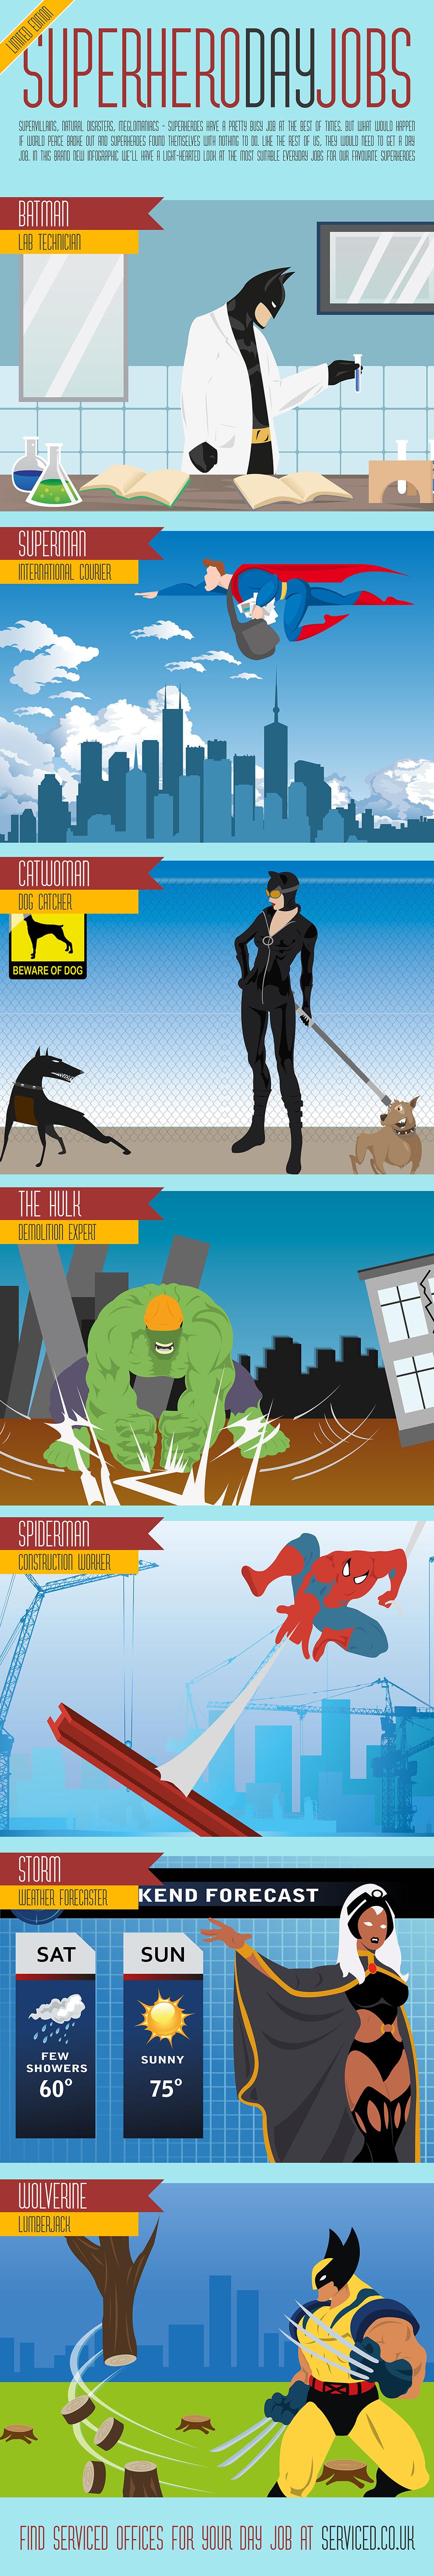 superhero day jobs infographic superhero worker dailyjobs superhero day jobs infographic superhero worker dailyjobs